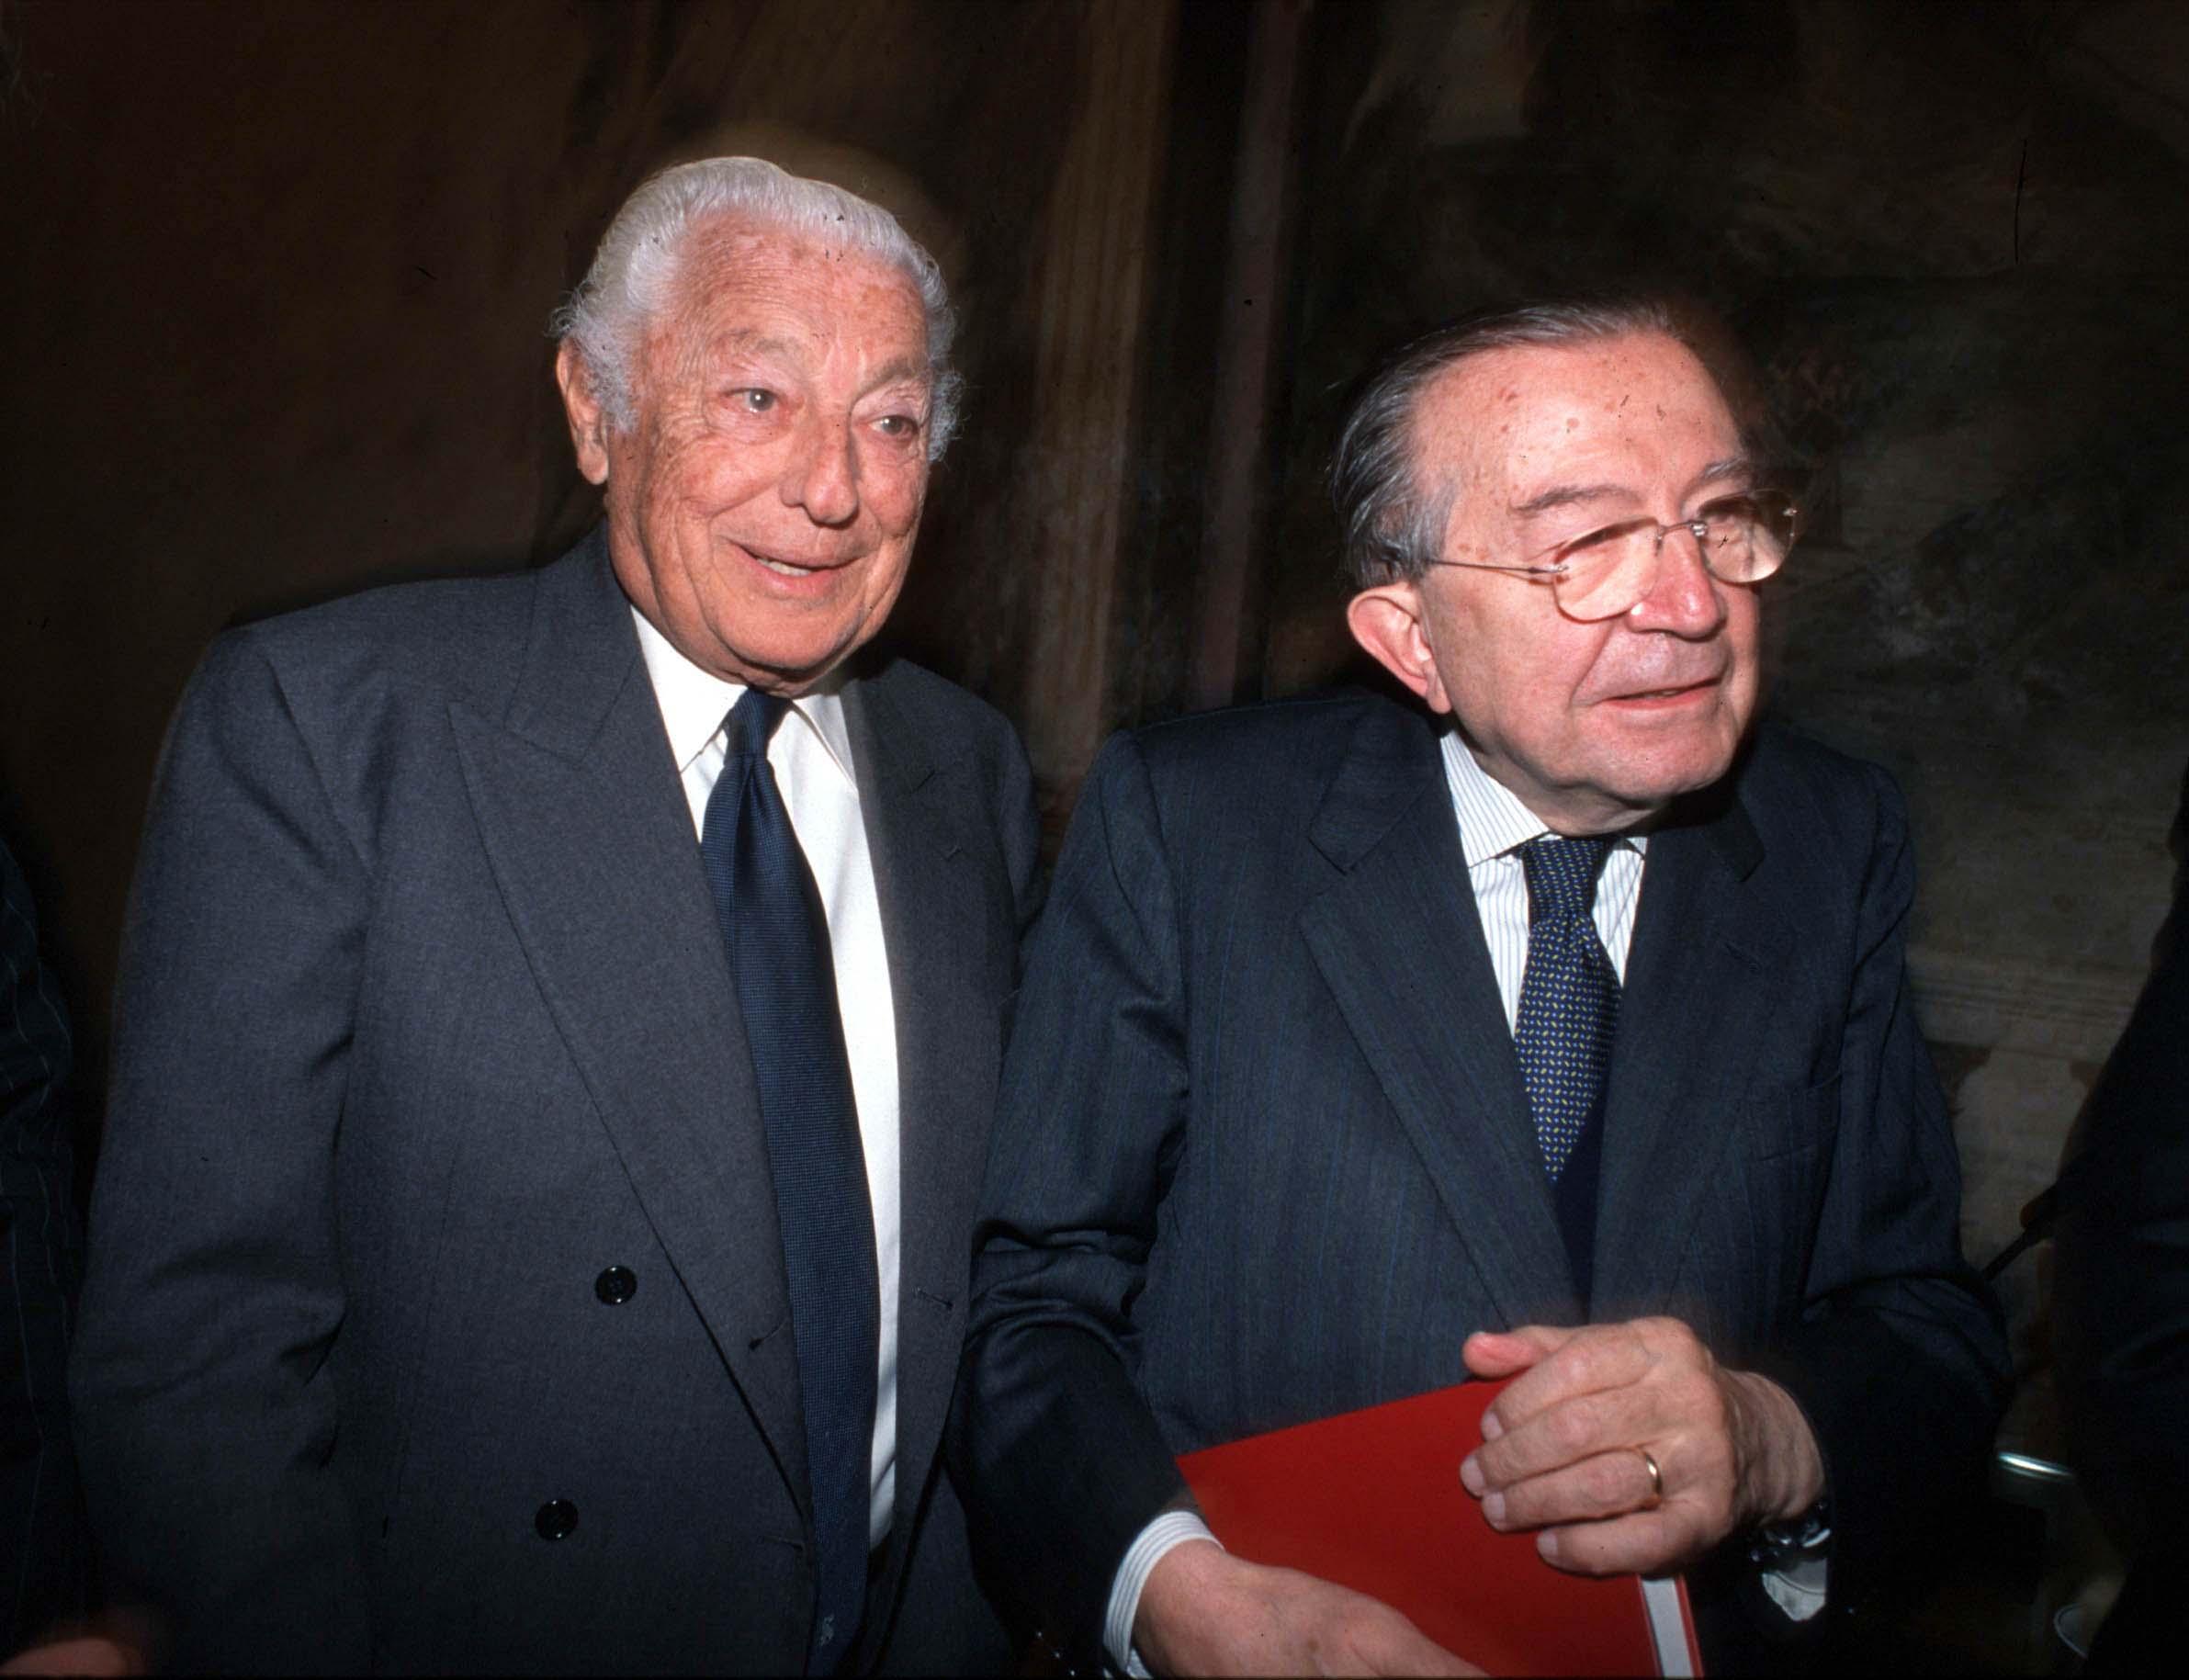 Life senators Gianni Rings and Giulio Andreotti